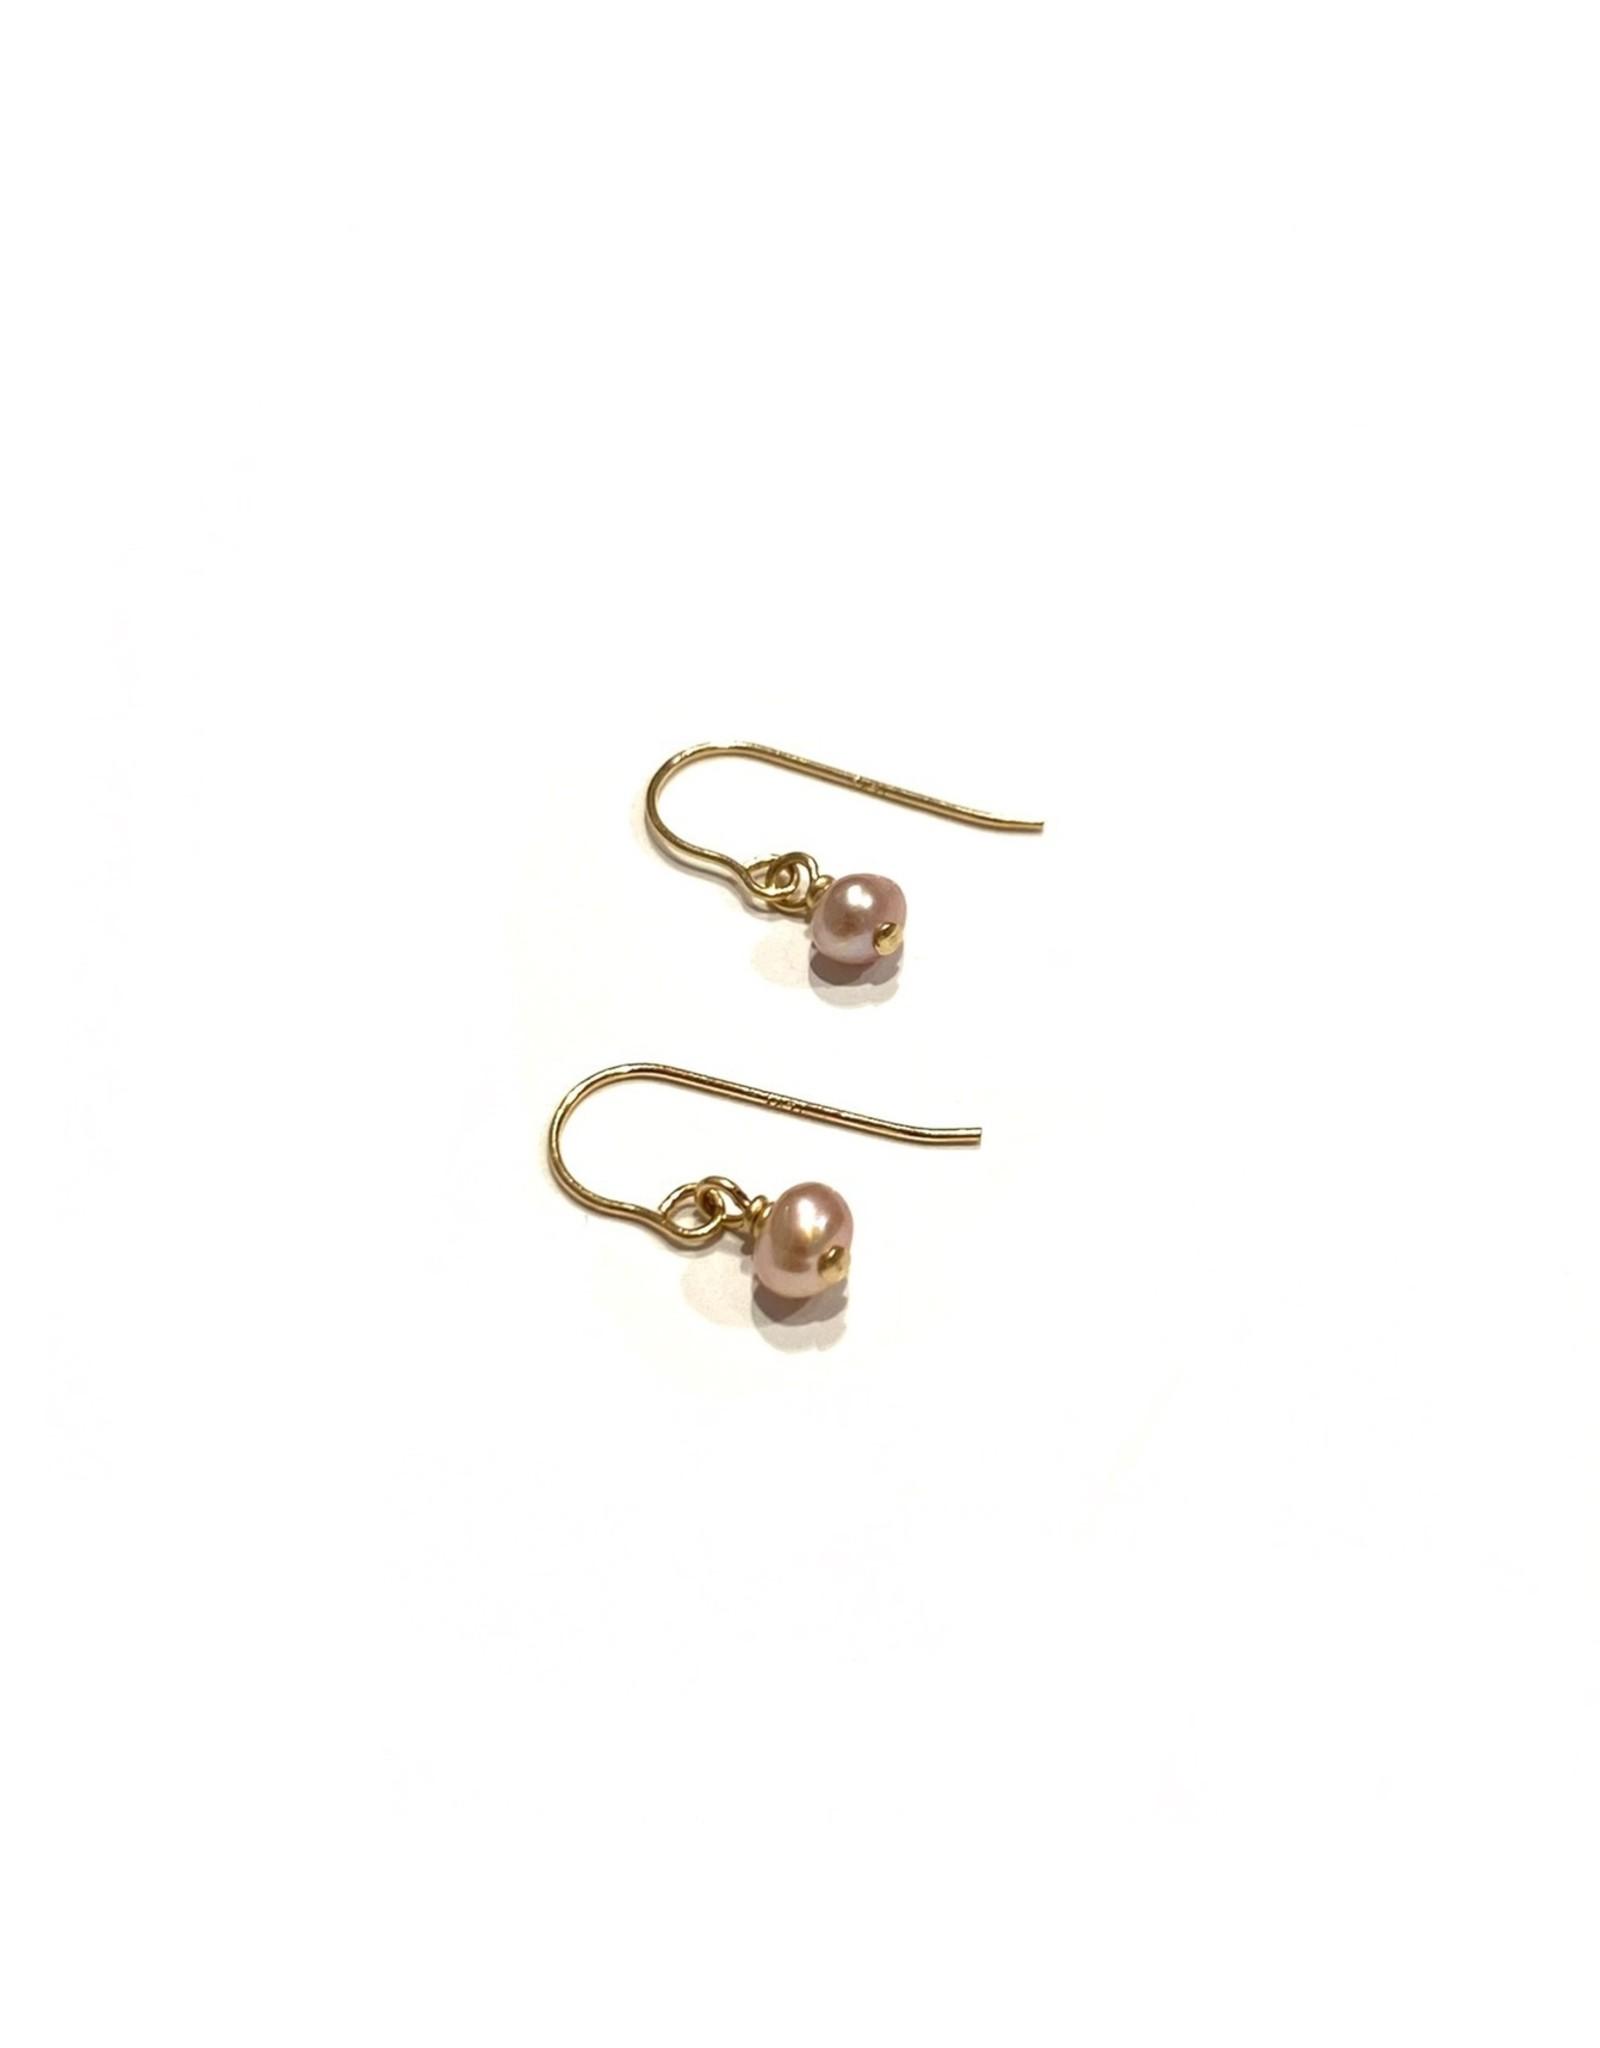 Bo Gold Earrings - Gold - Pearl